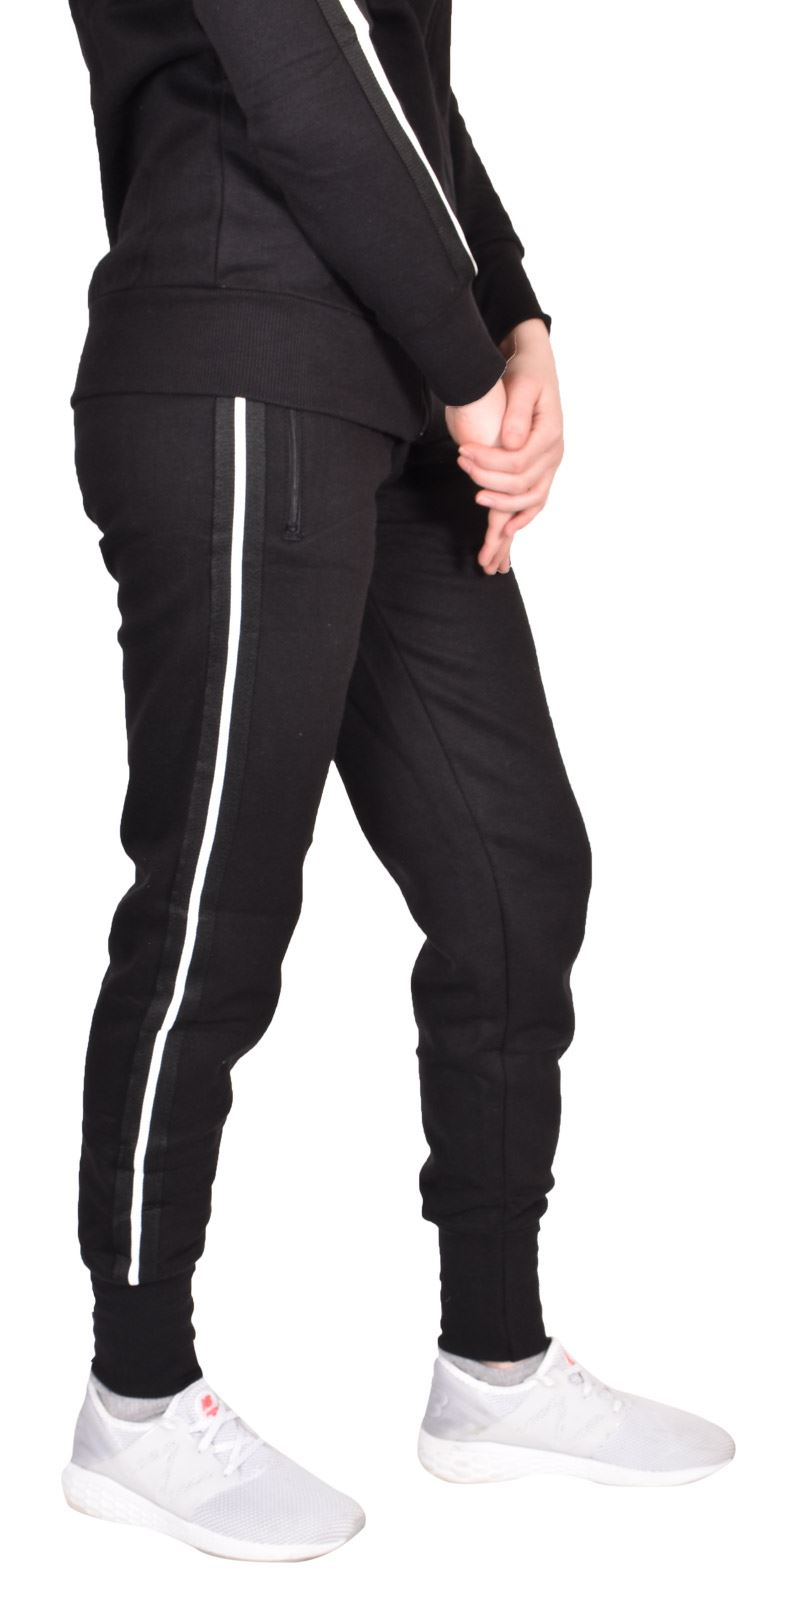 skechers women's clothing